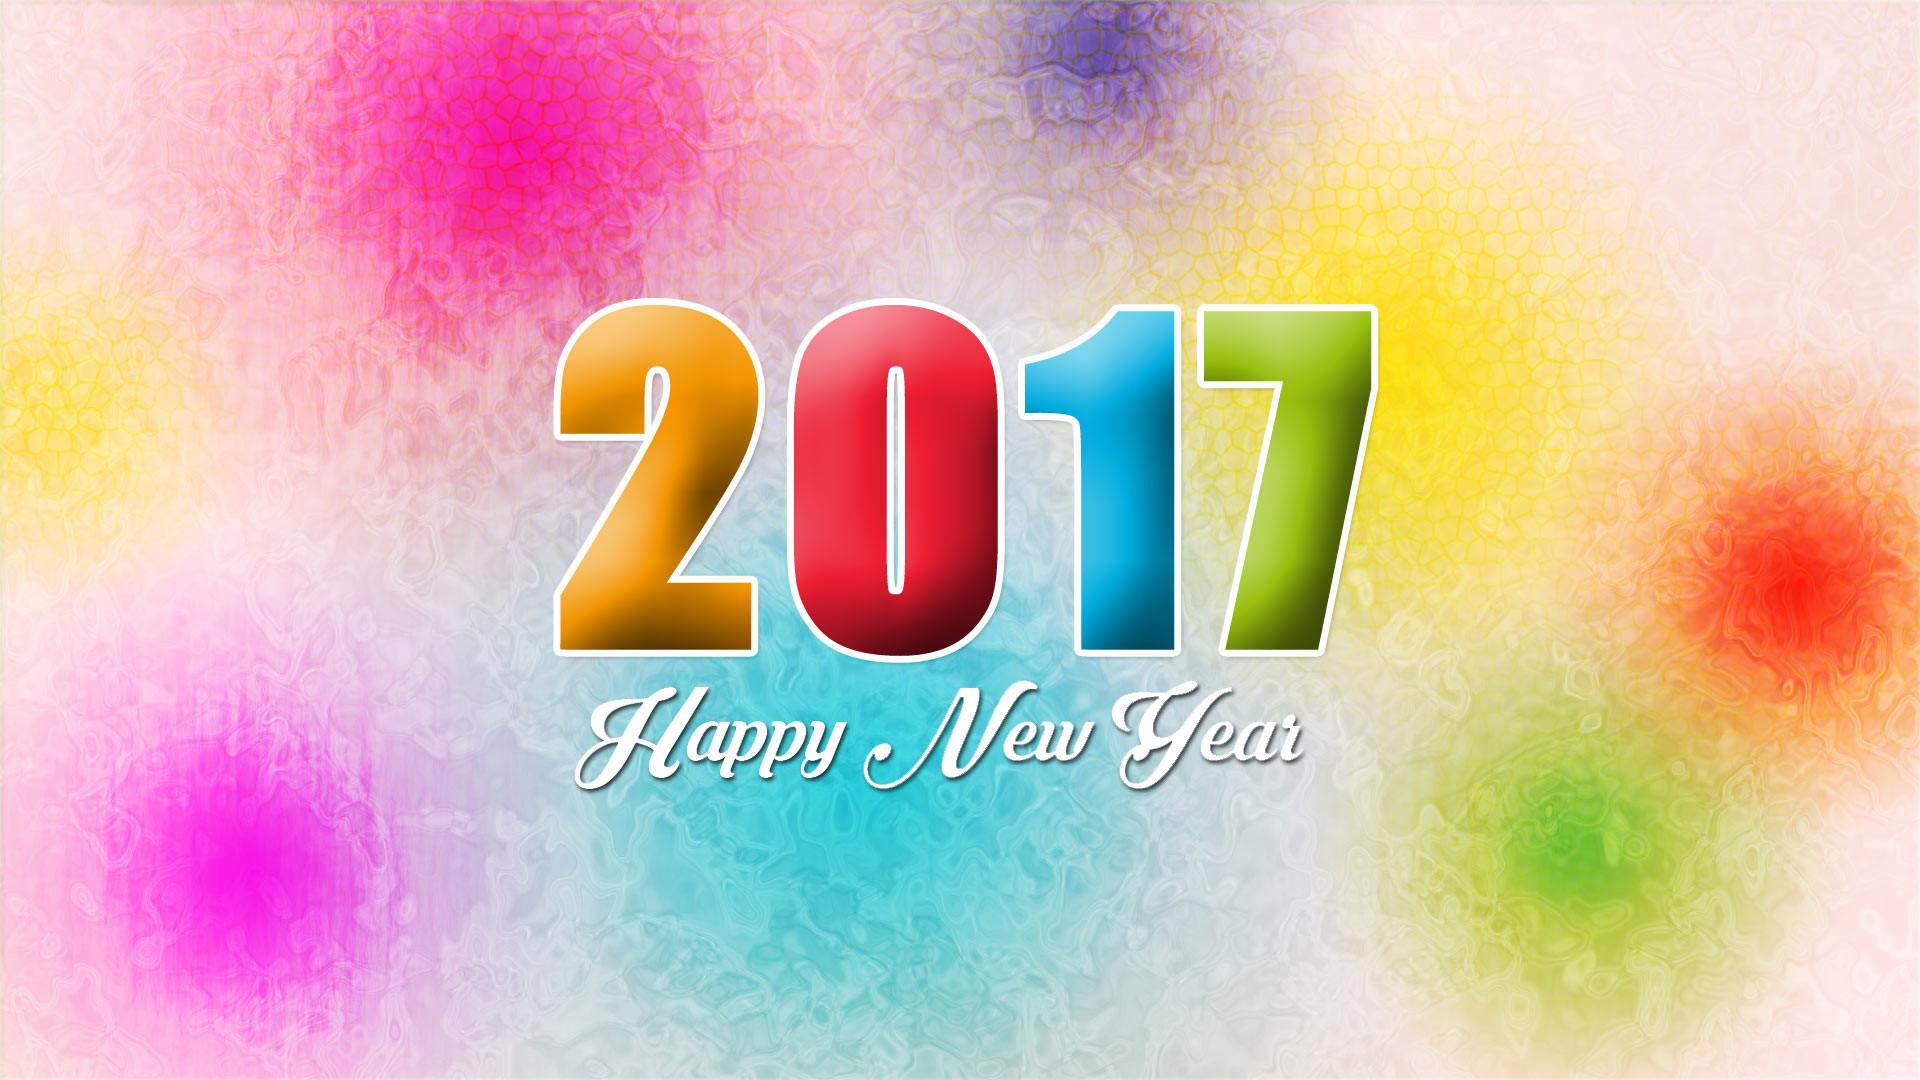 rainbow-new-year-2017-hd-wallpaper